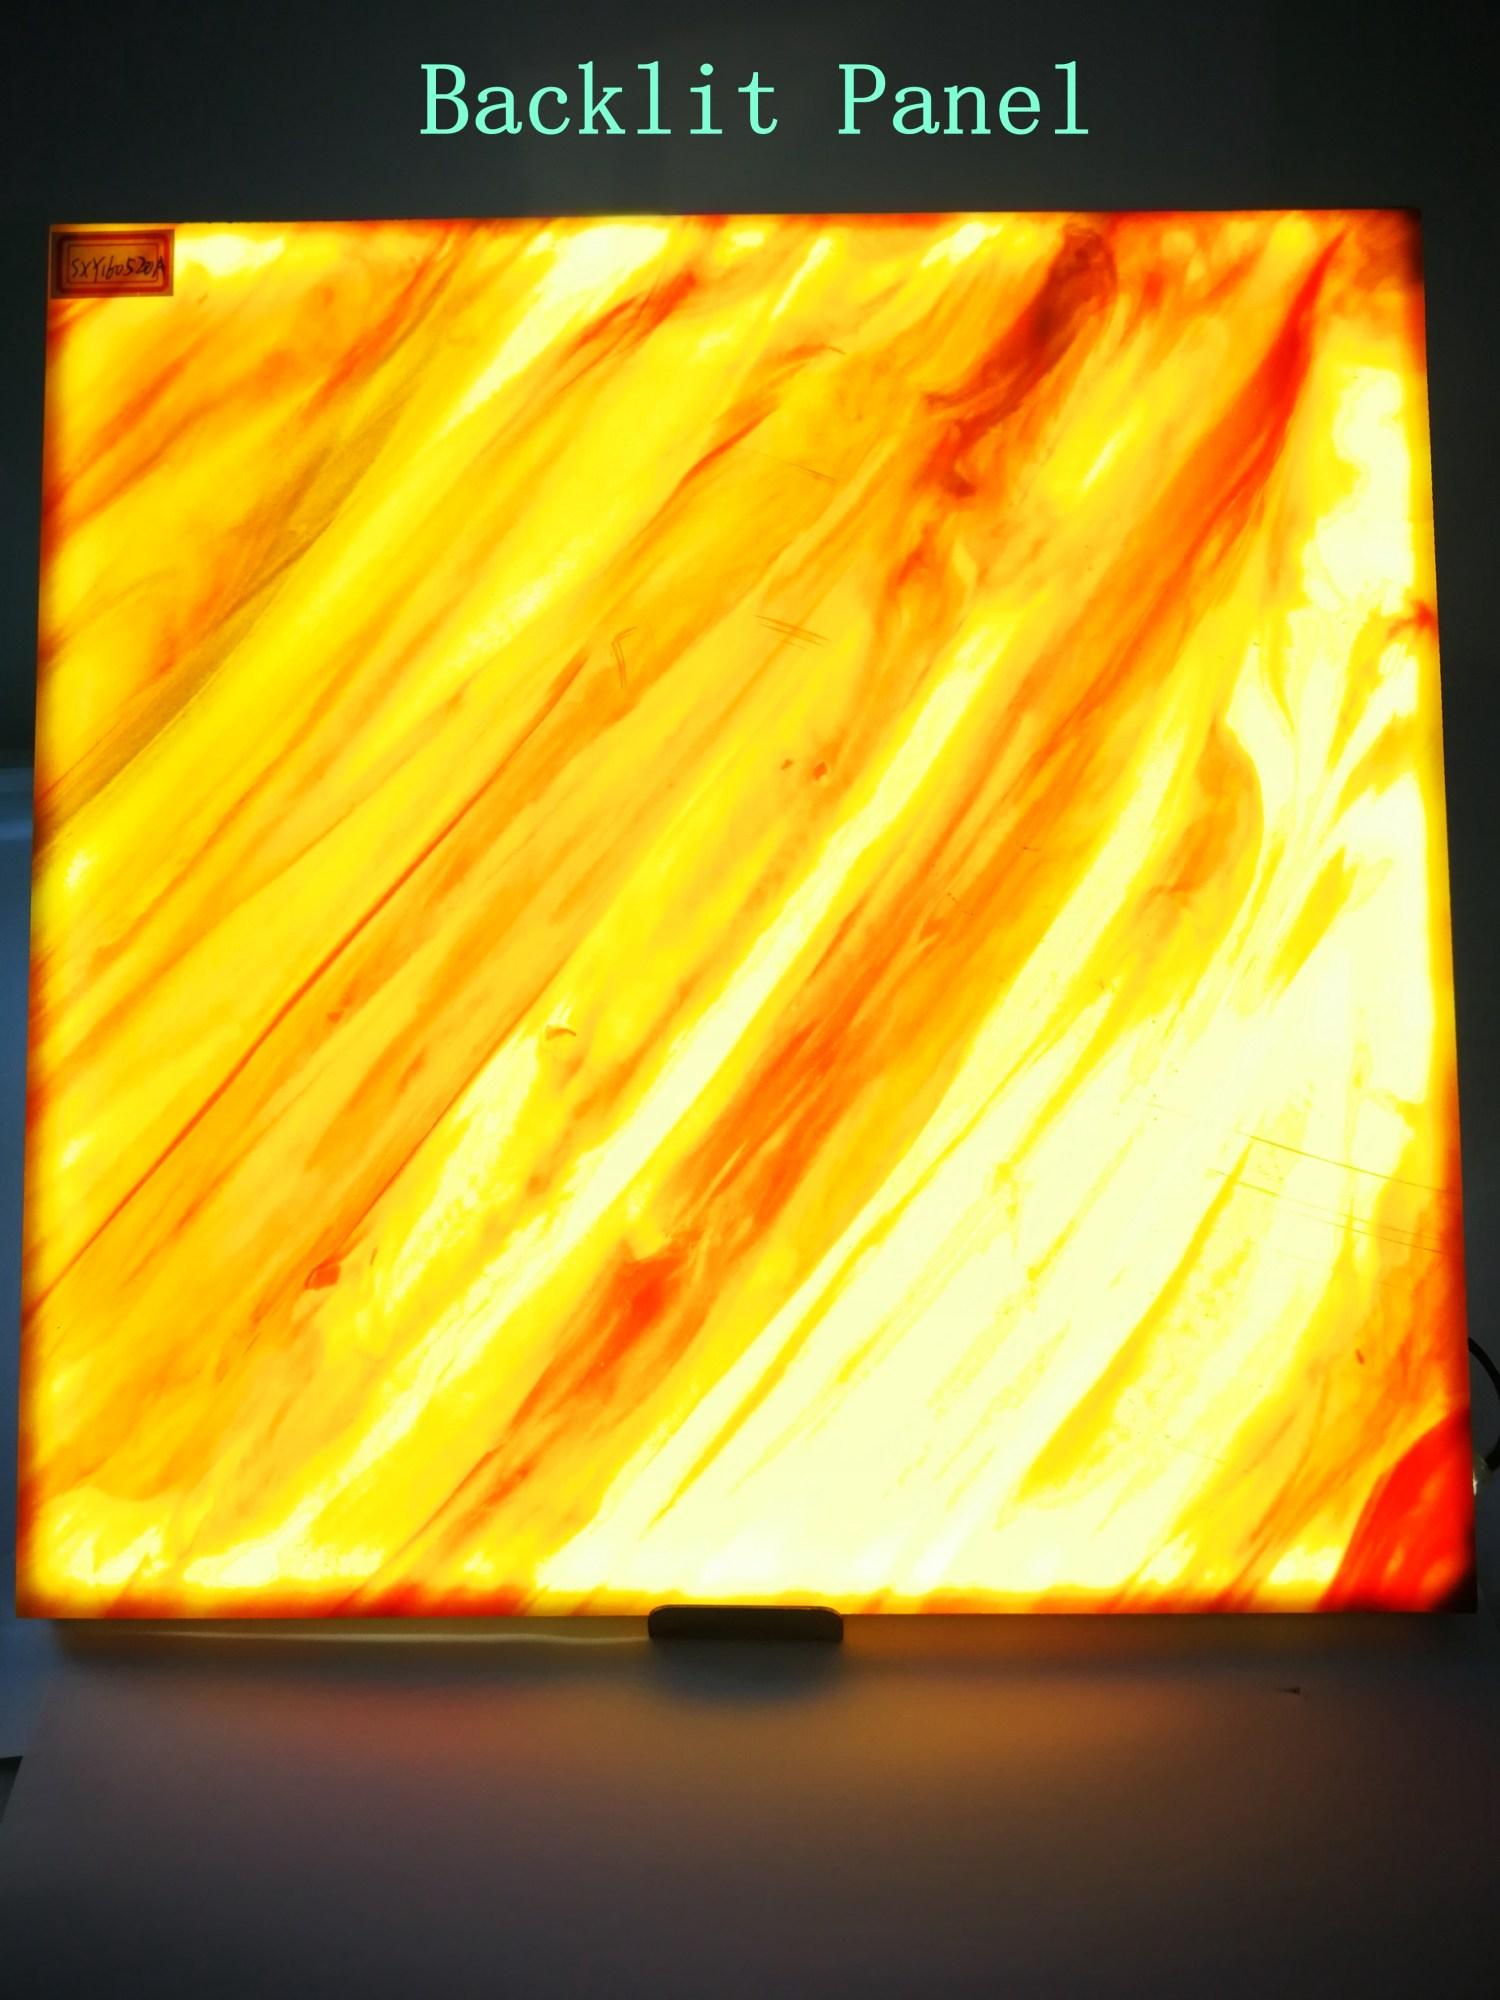 Backlit onyx stone